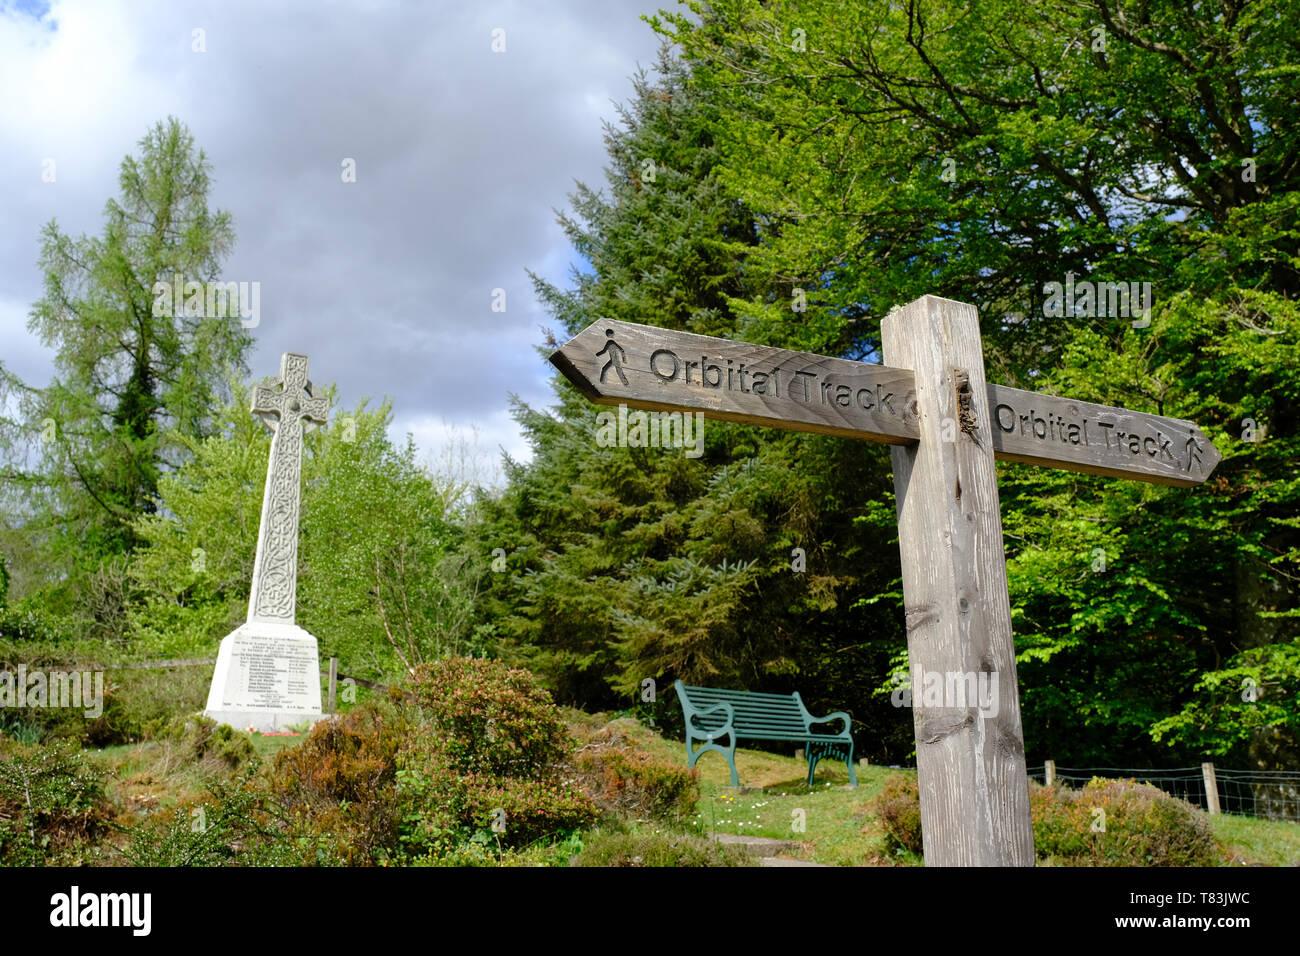 The Orbital Track around Glencoe village where it passes the War Memorial. - Stock Image